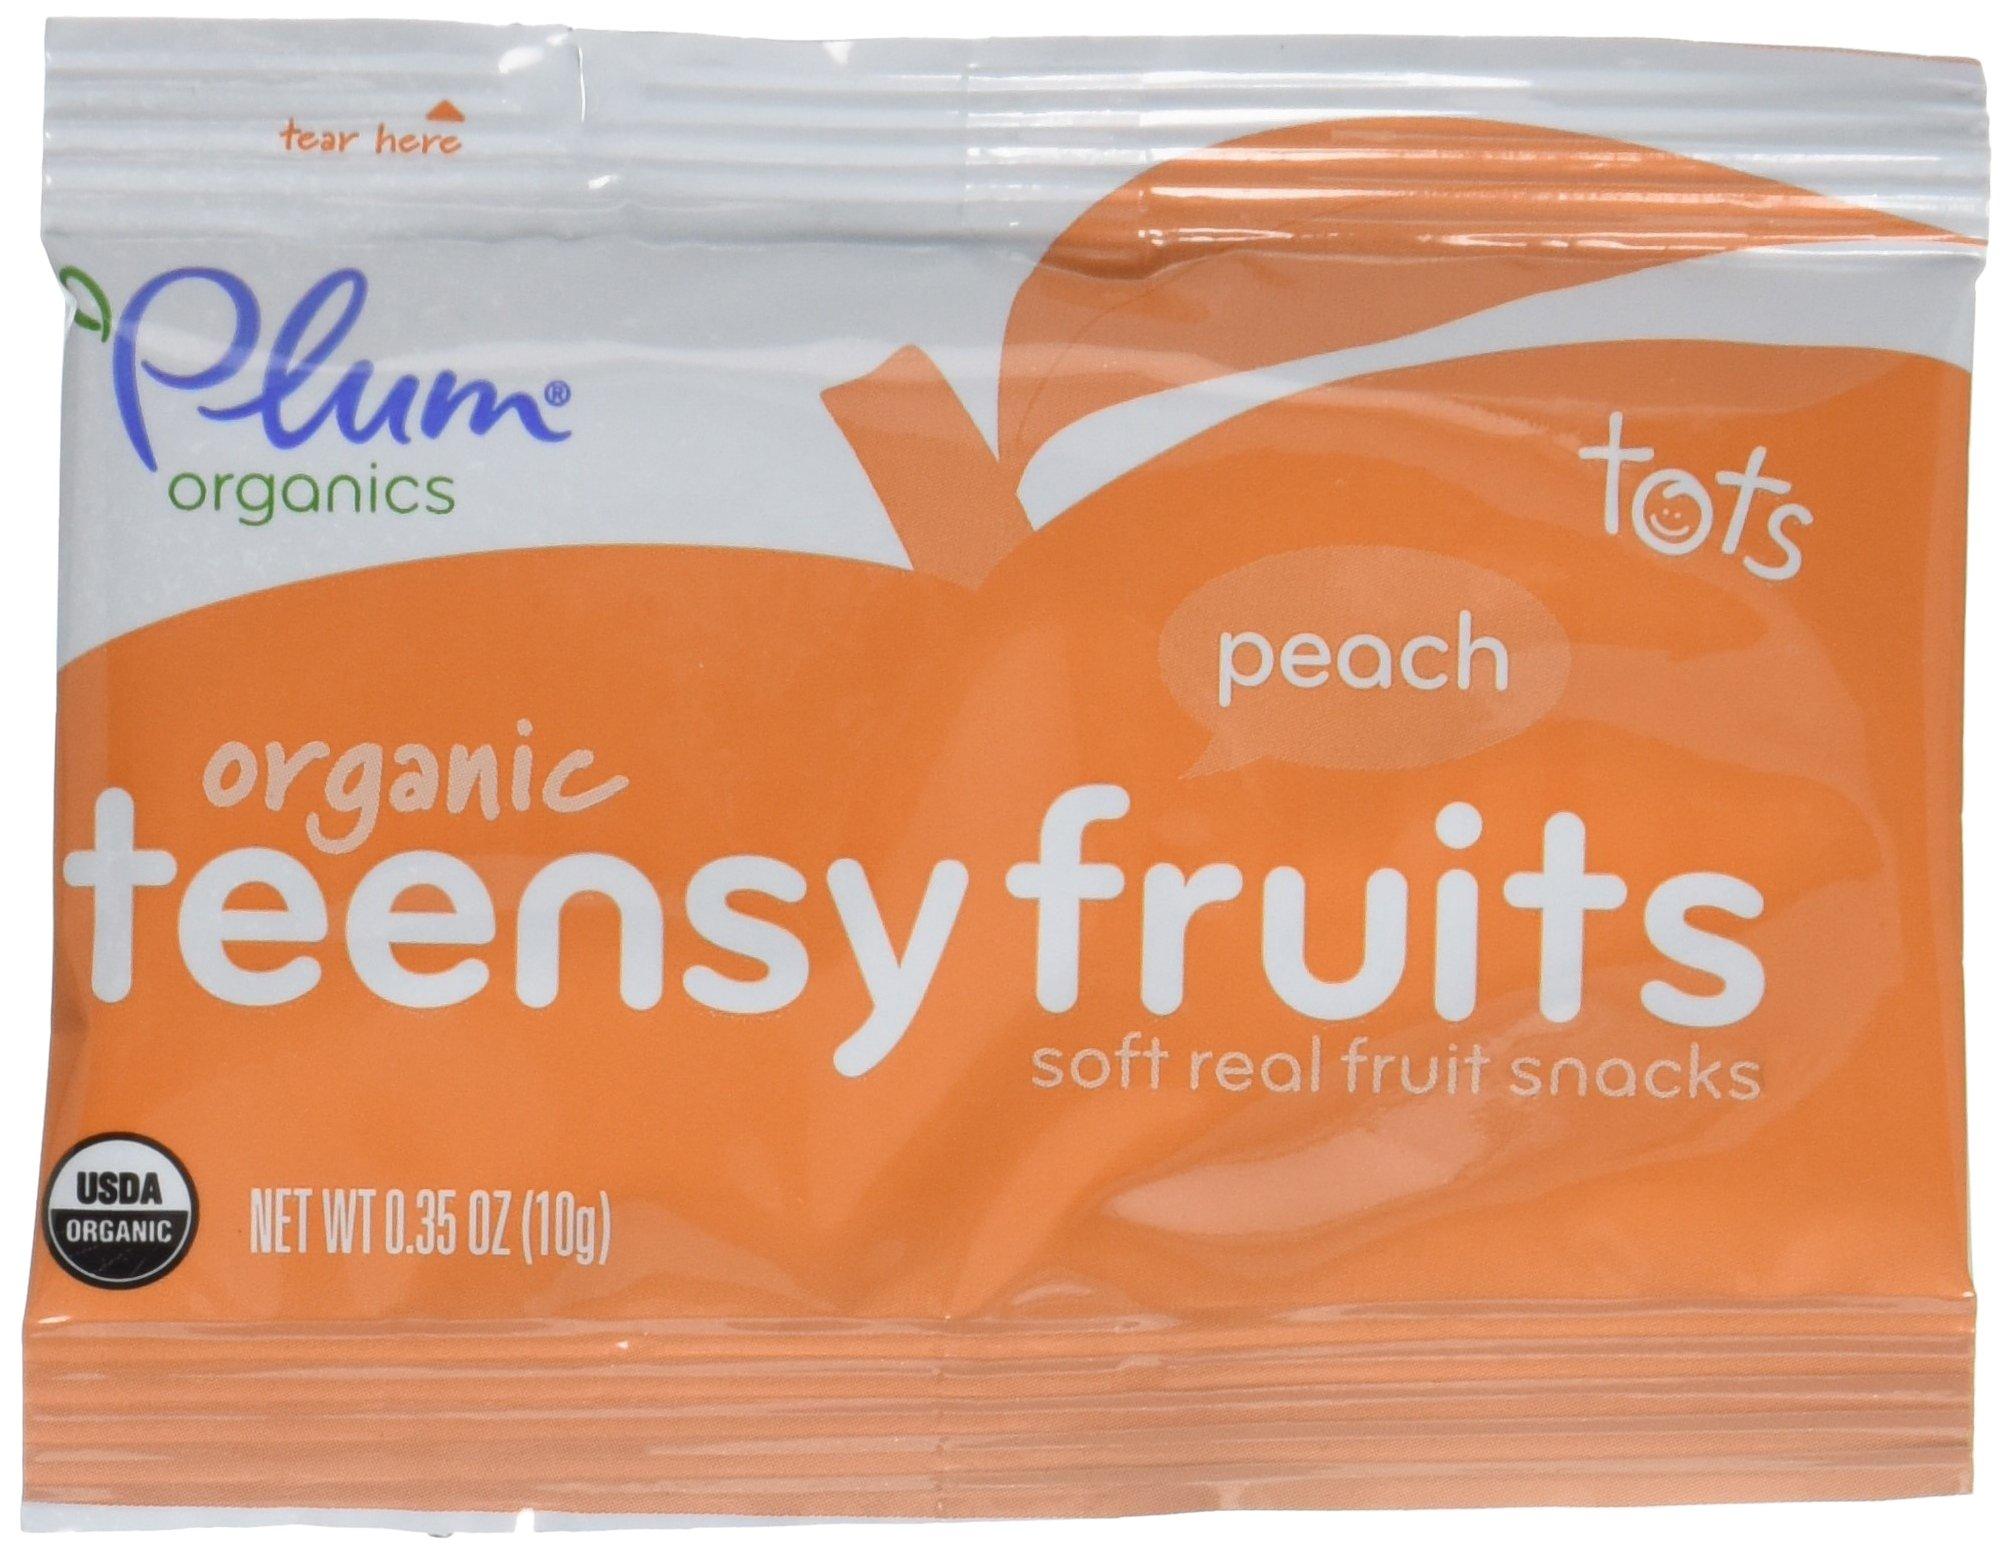 Plum Organics Tots Teensy Fruits - Peach - 1.75 oz